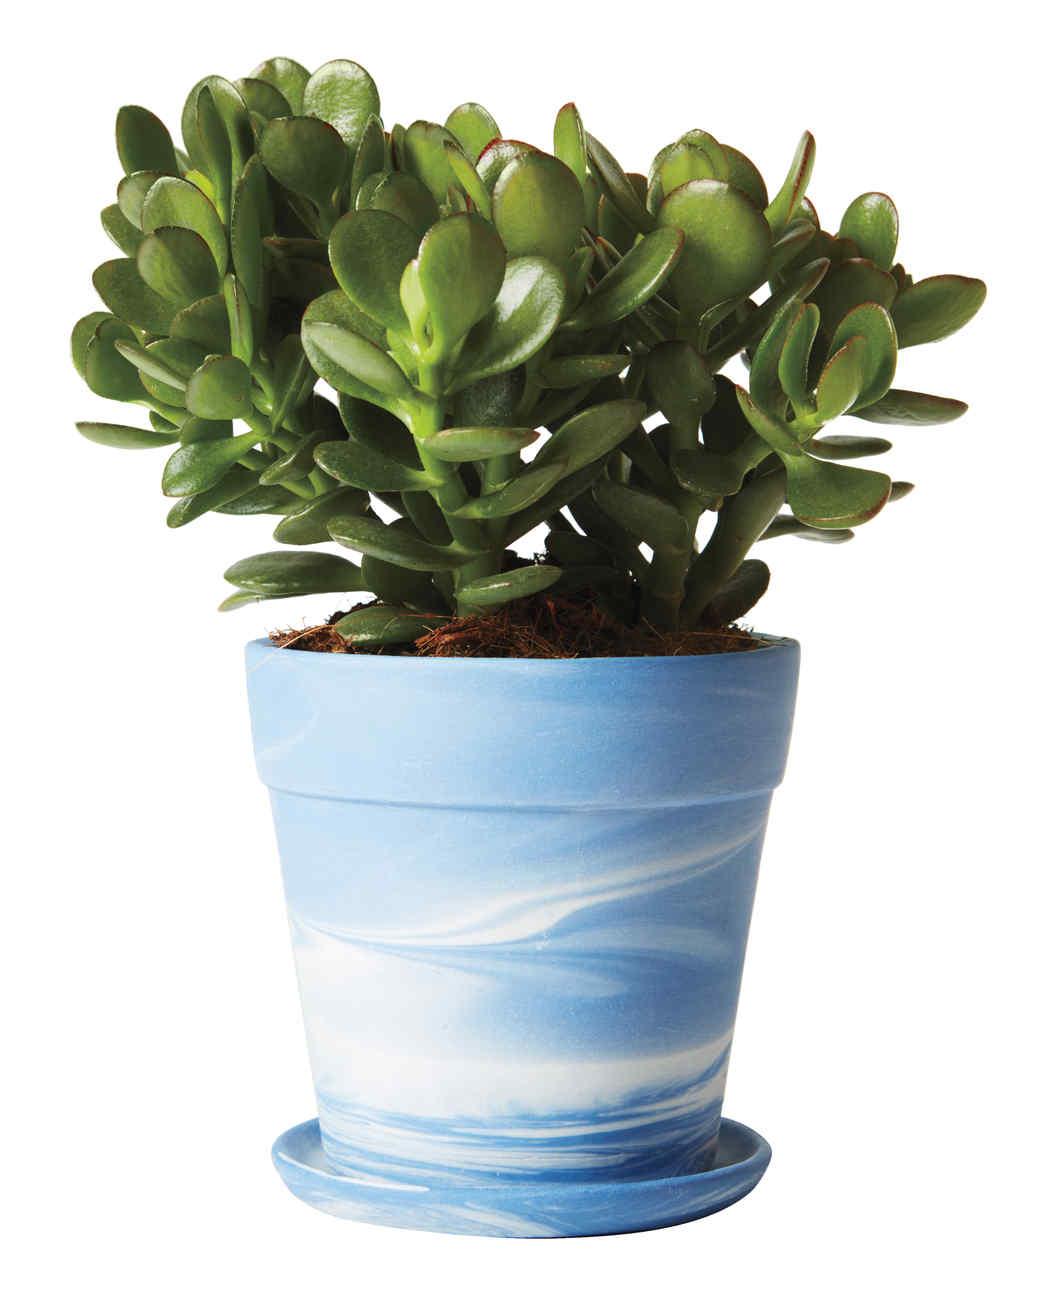 planter-219-d112494.jpg